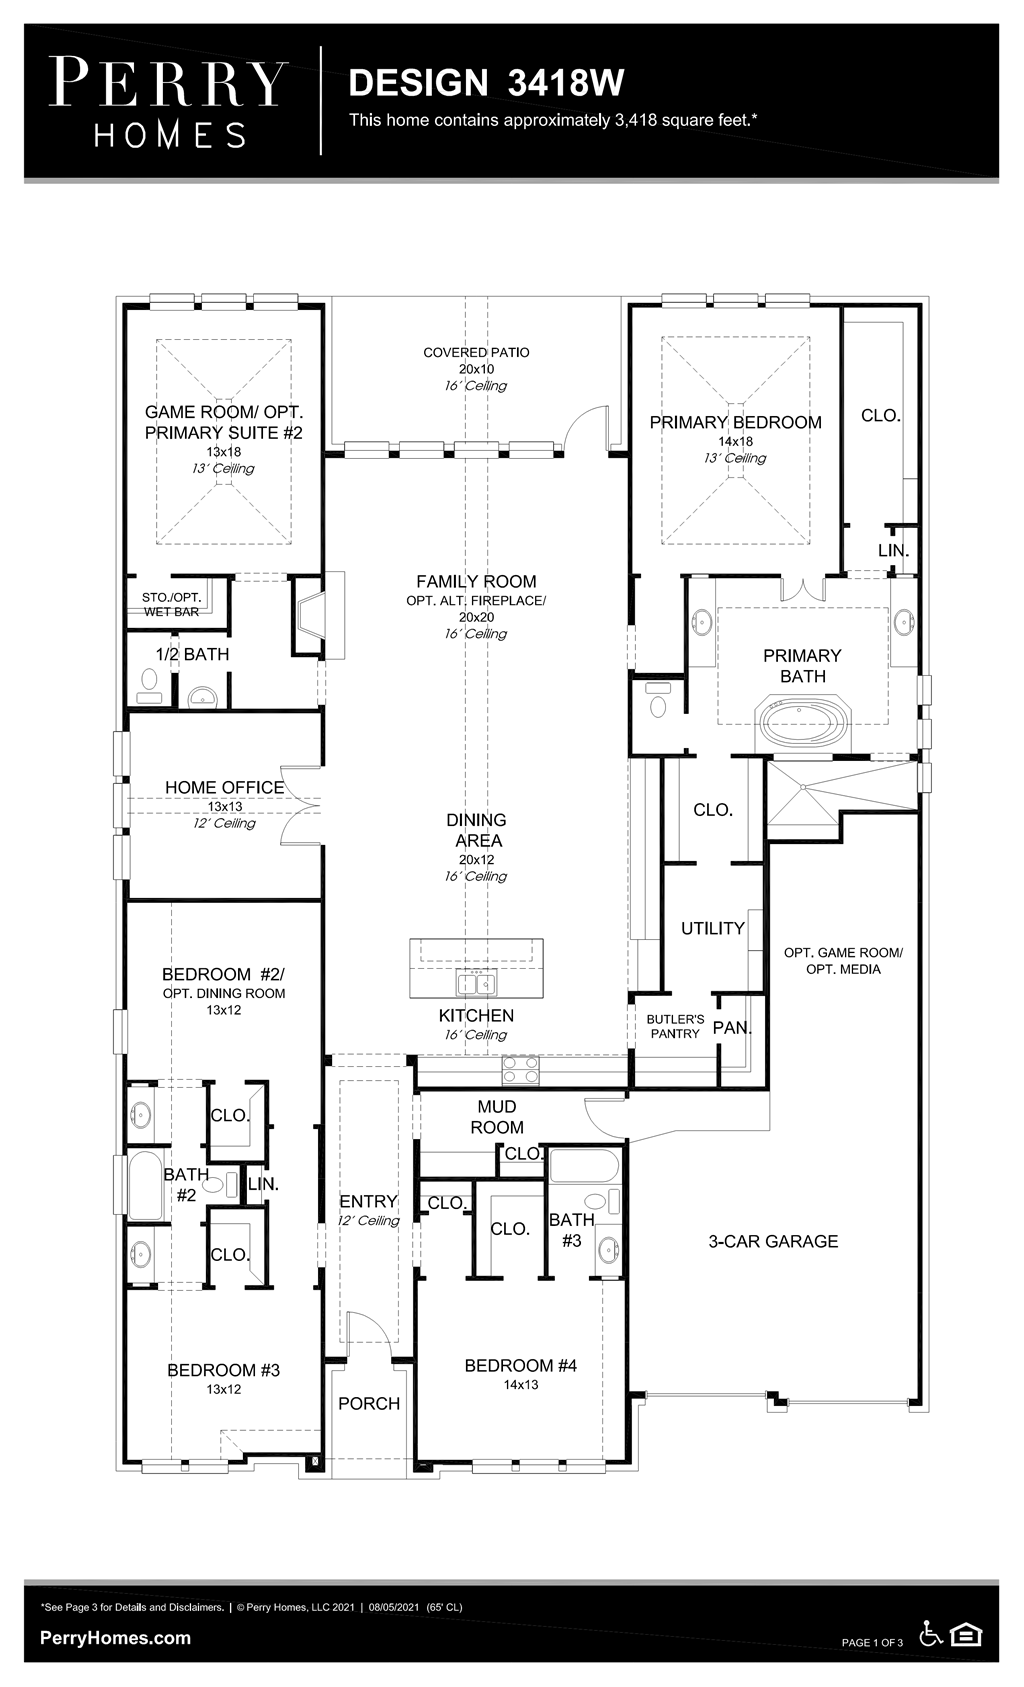 Floor Plan for 3418W